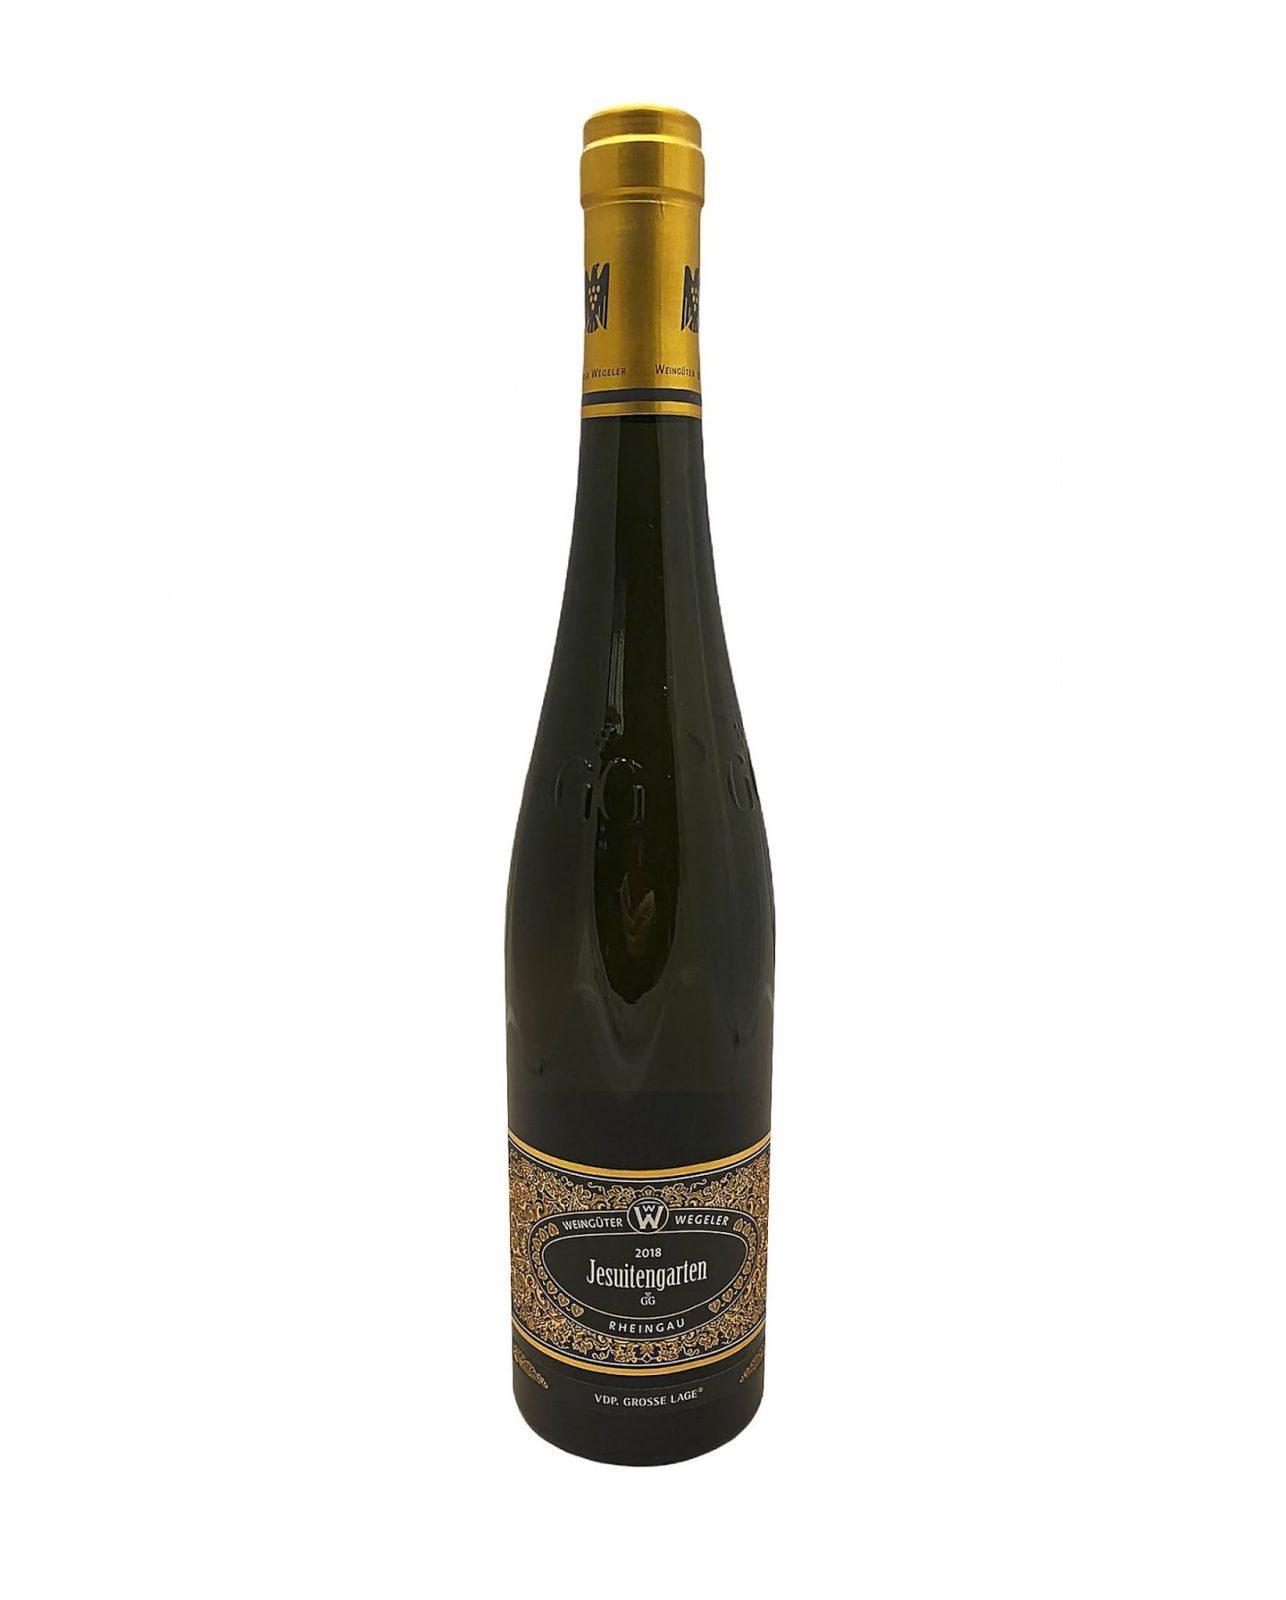 Rheingau Jesuitengarten, vinotéka Bratislava Sunny wines, slnecnice mesto, rozvoz vina, nemecke biele vino